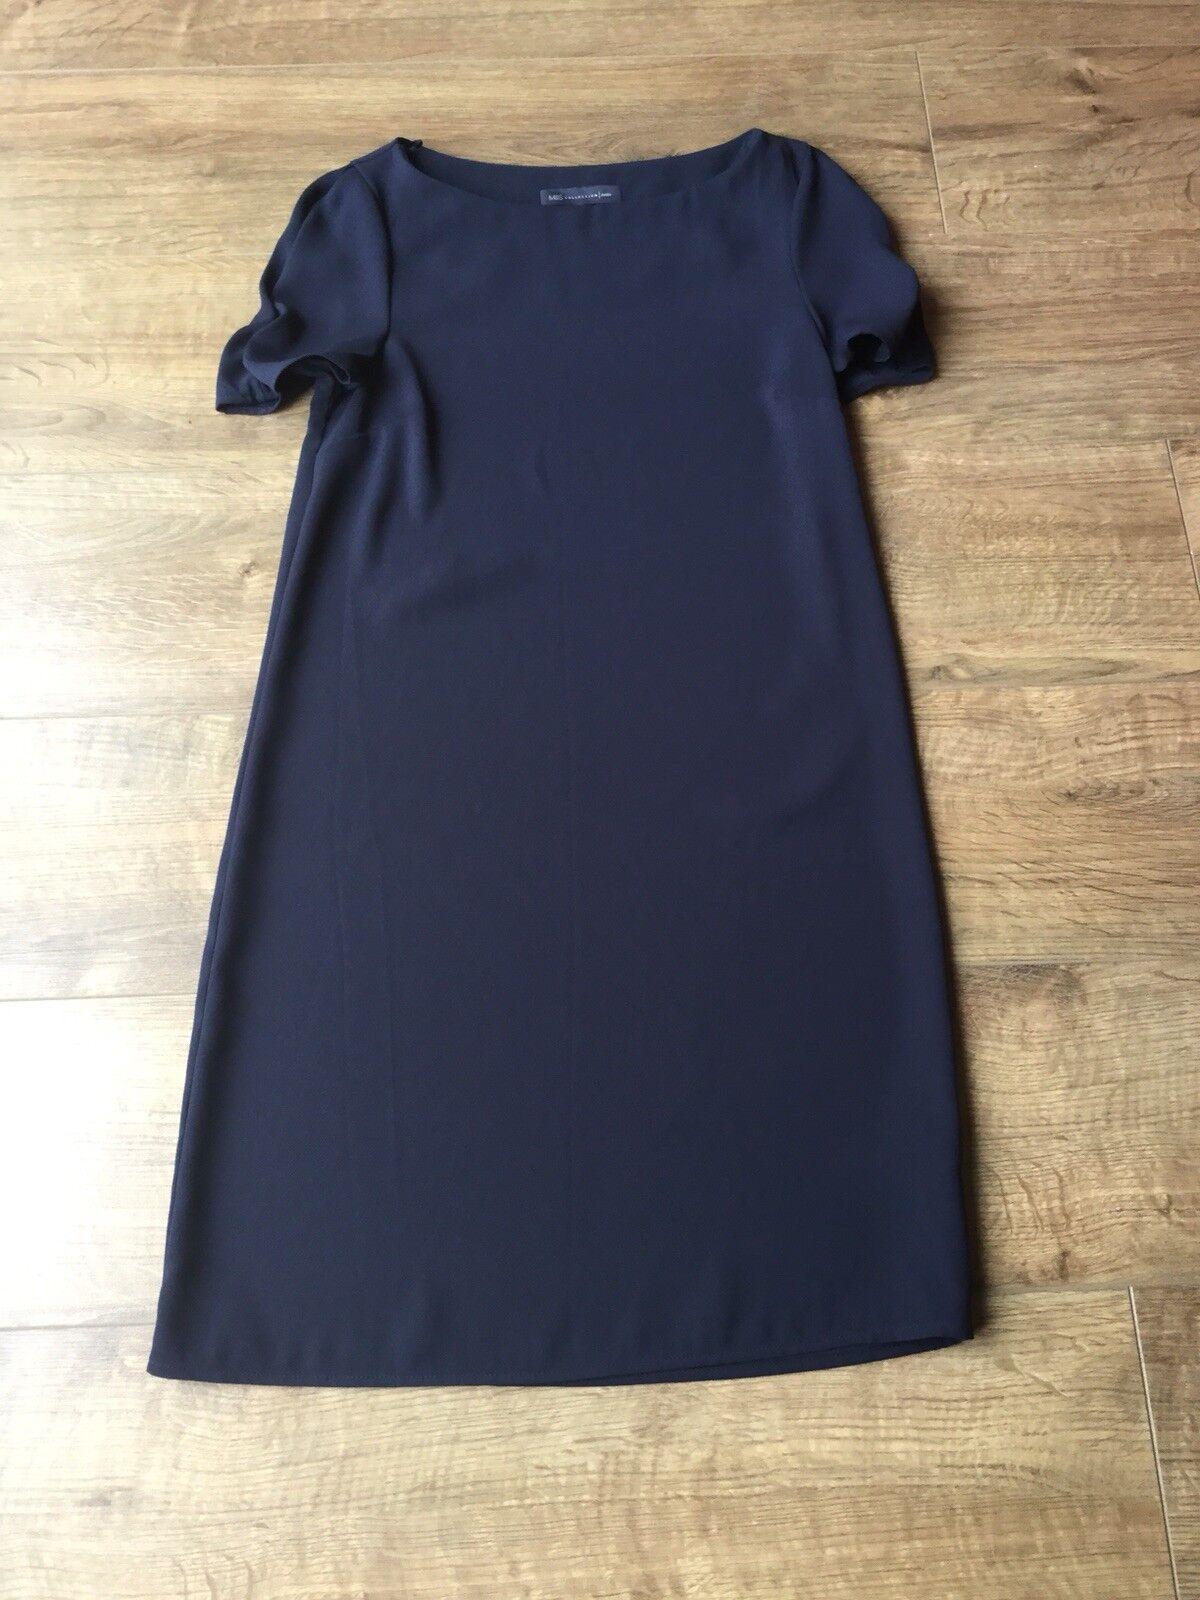 BNWOT Ladies M&S Collection Navy Dress - Größe UK 6 Petite